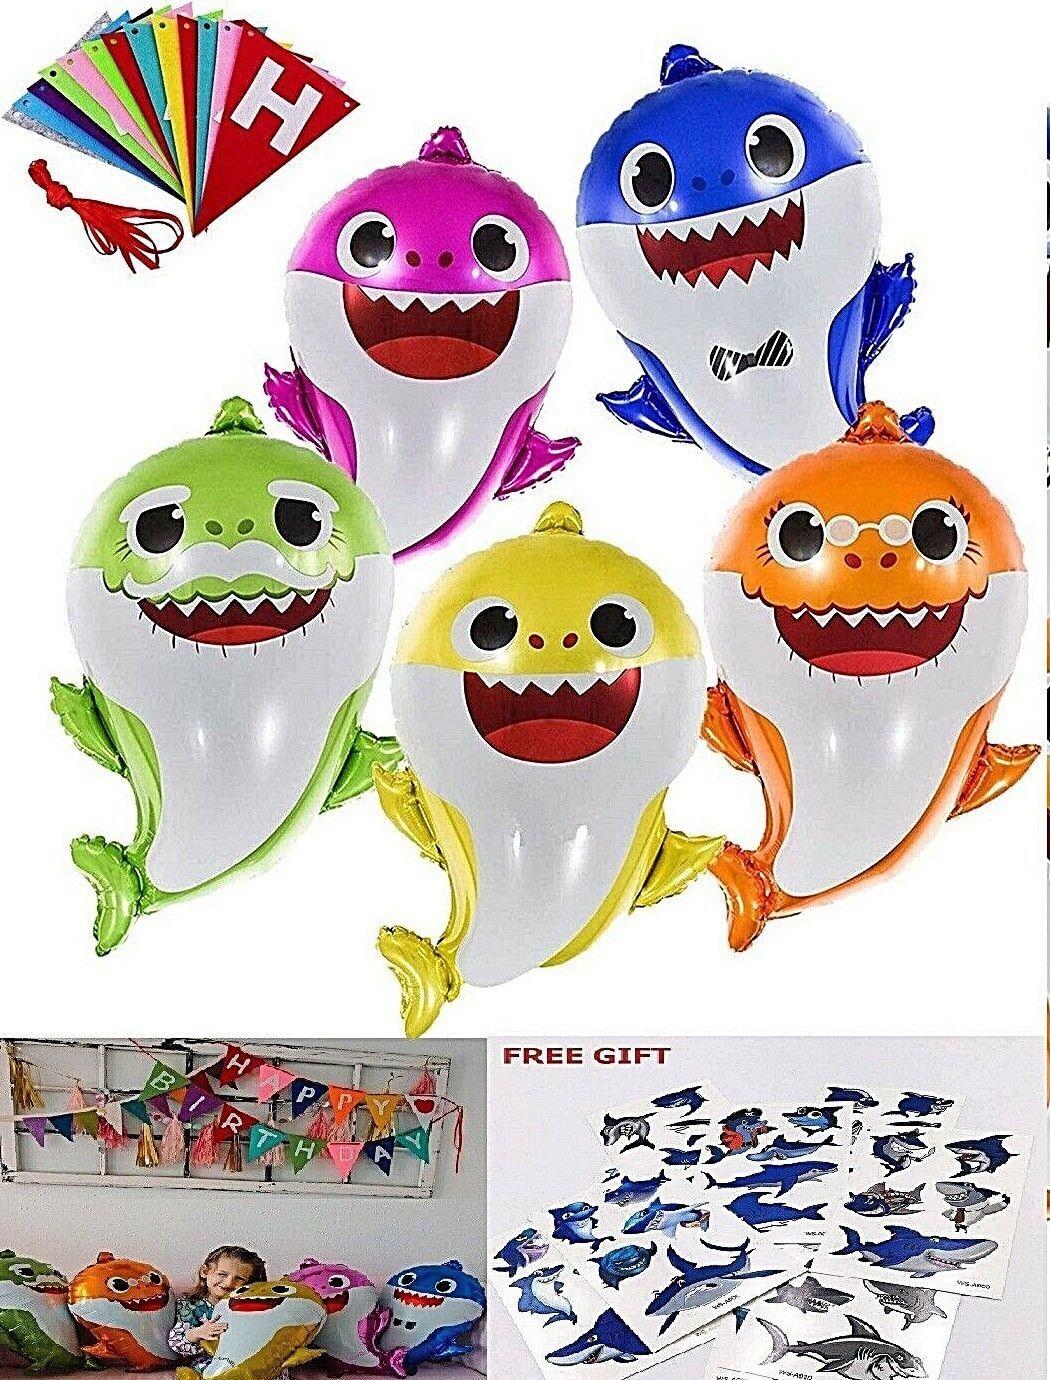 Baby Shark Balloons 26″ Happy Birthday Banner Party Decorations Free Tattoos NIB Balloons